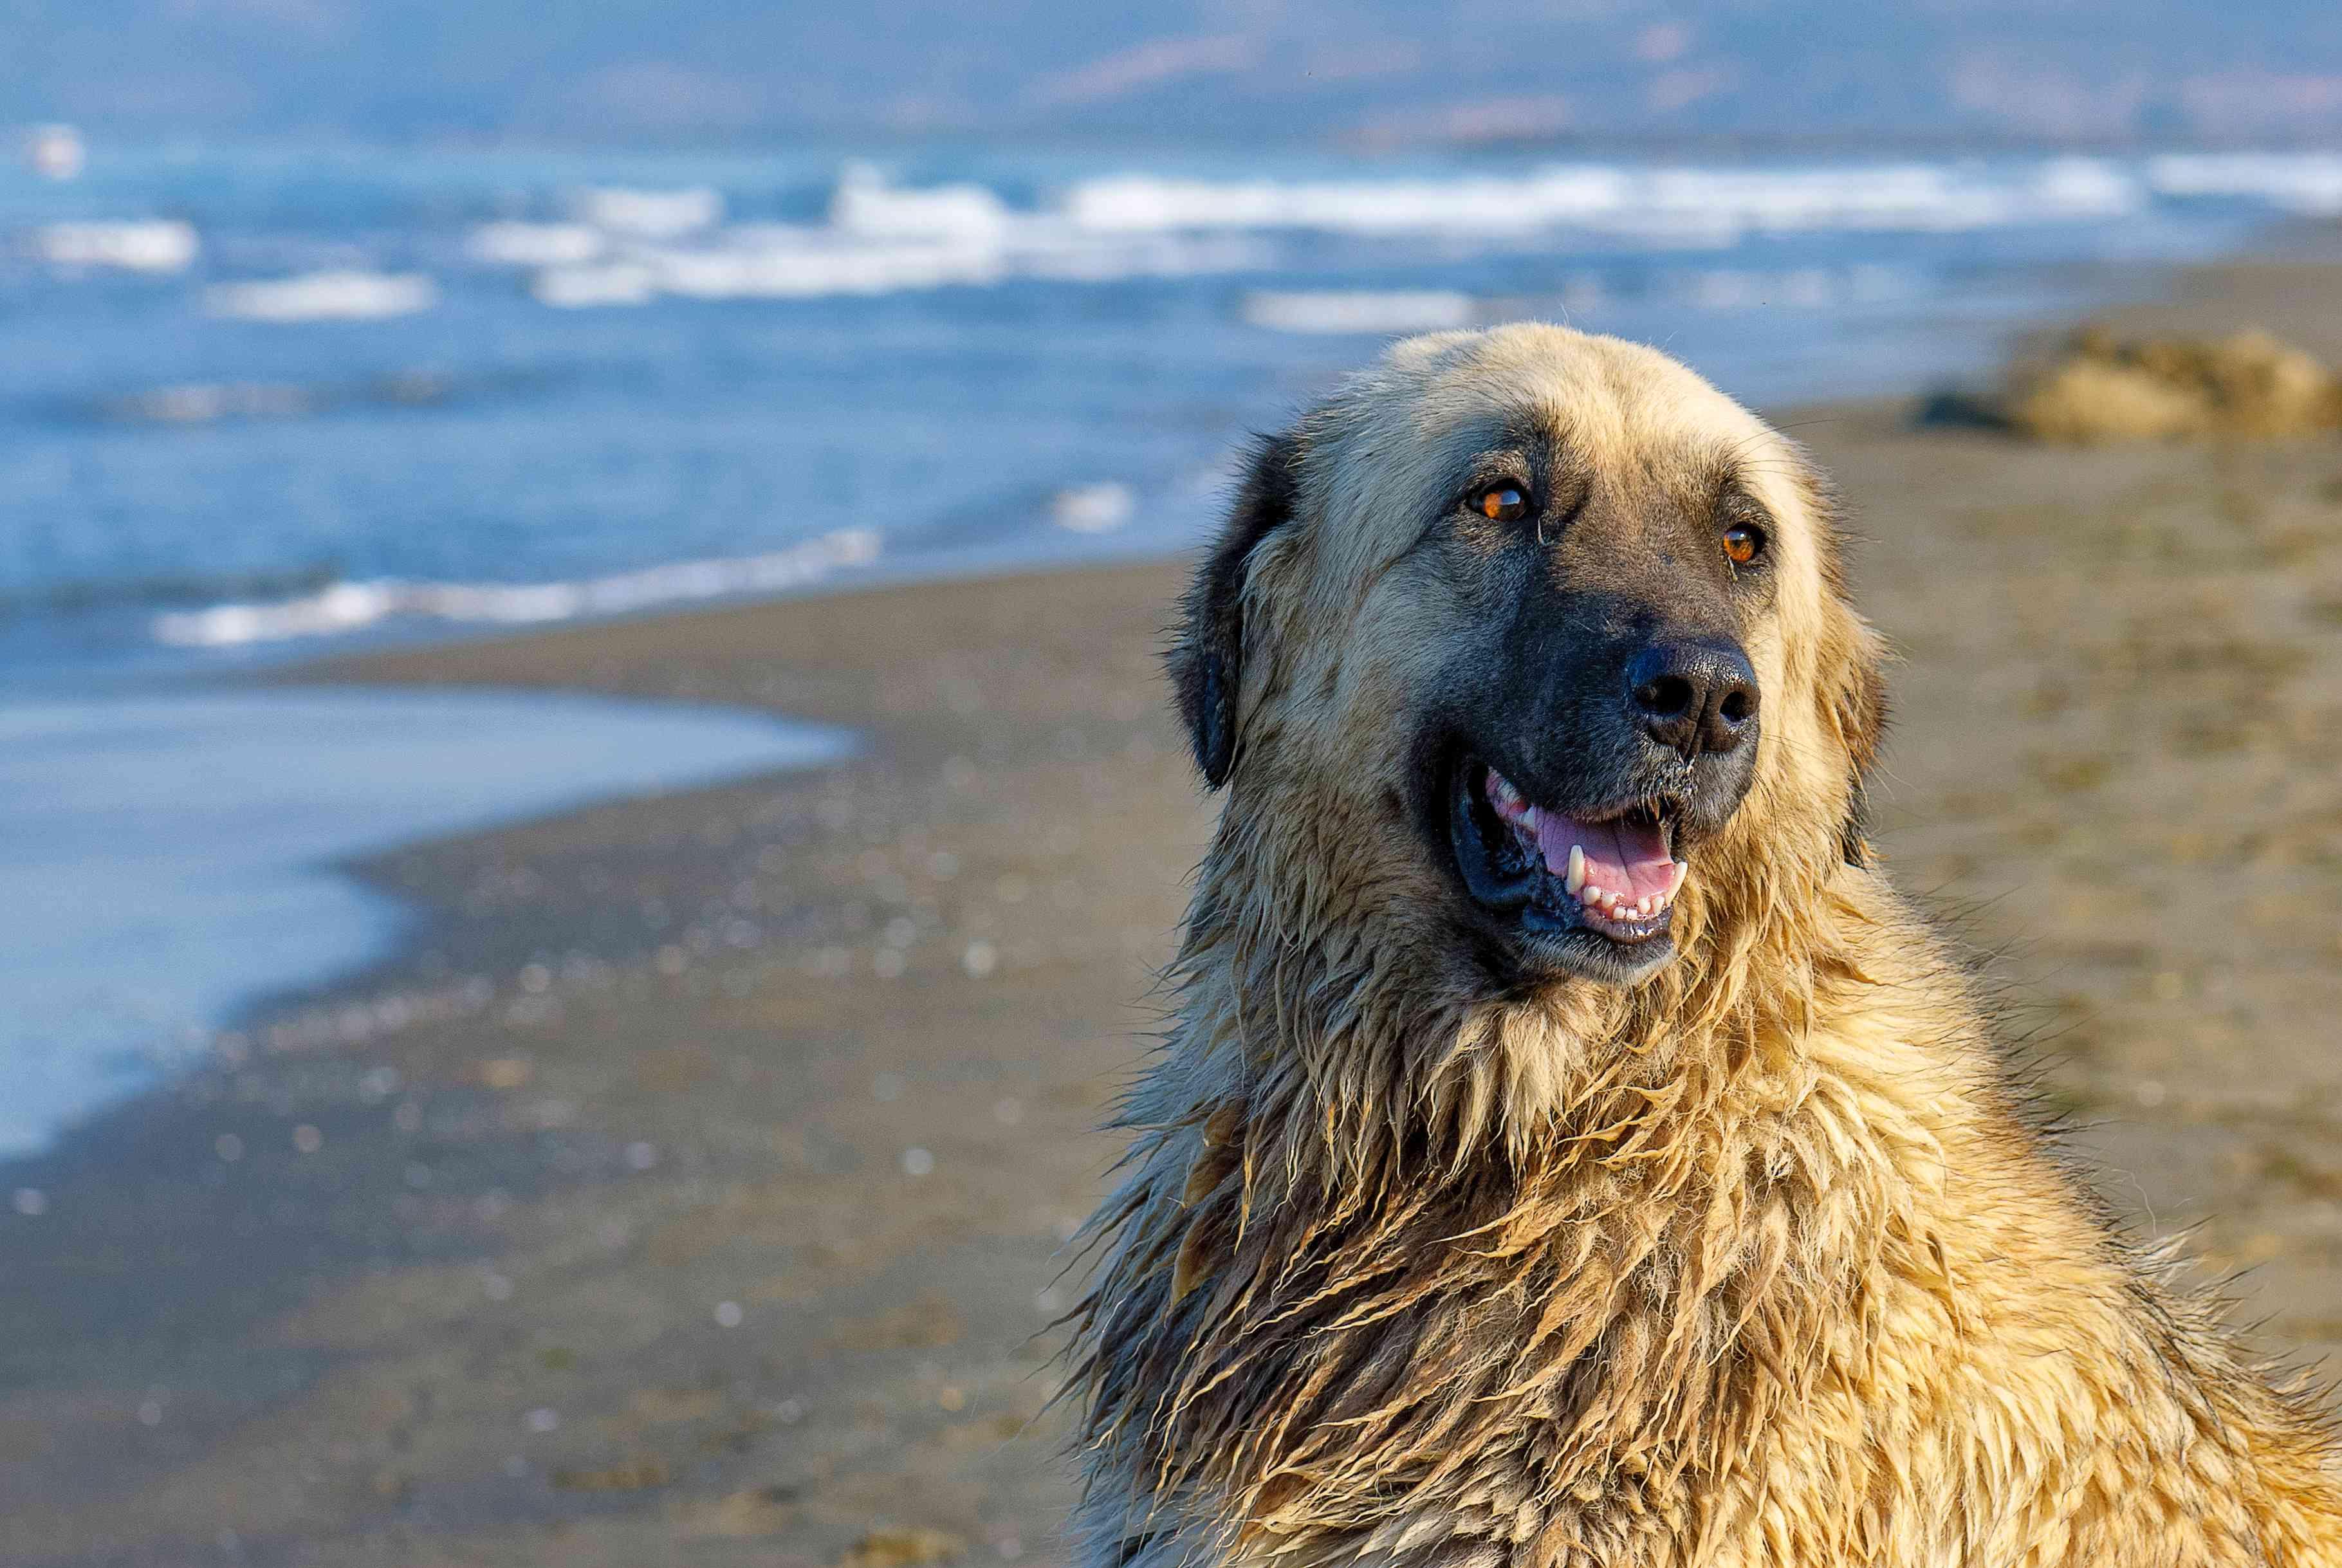 Estrela mountain dog sitting on a beach